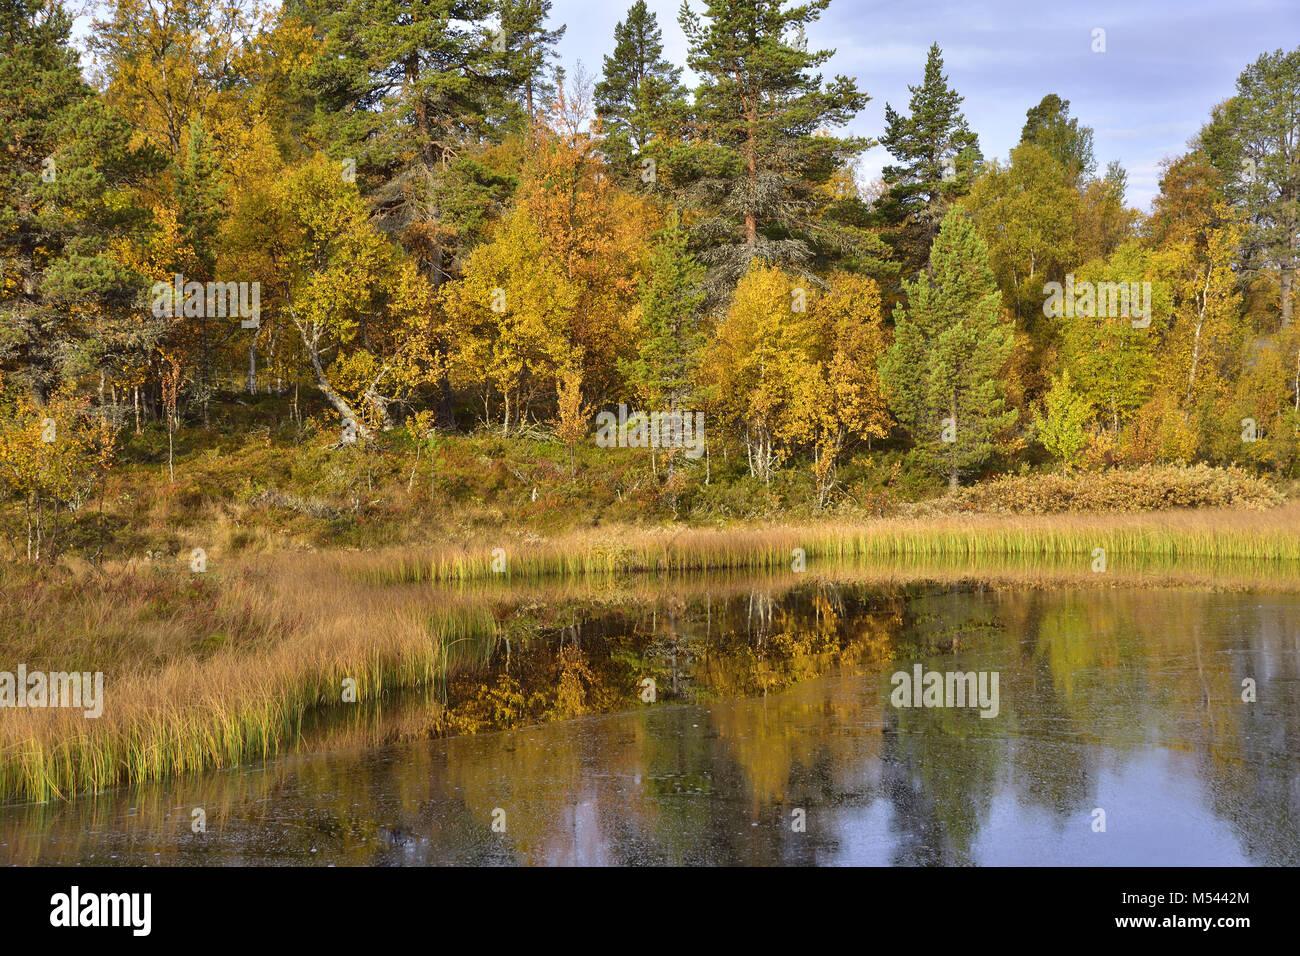 Rogen nature reserve - Stock Image